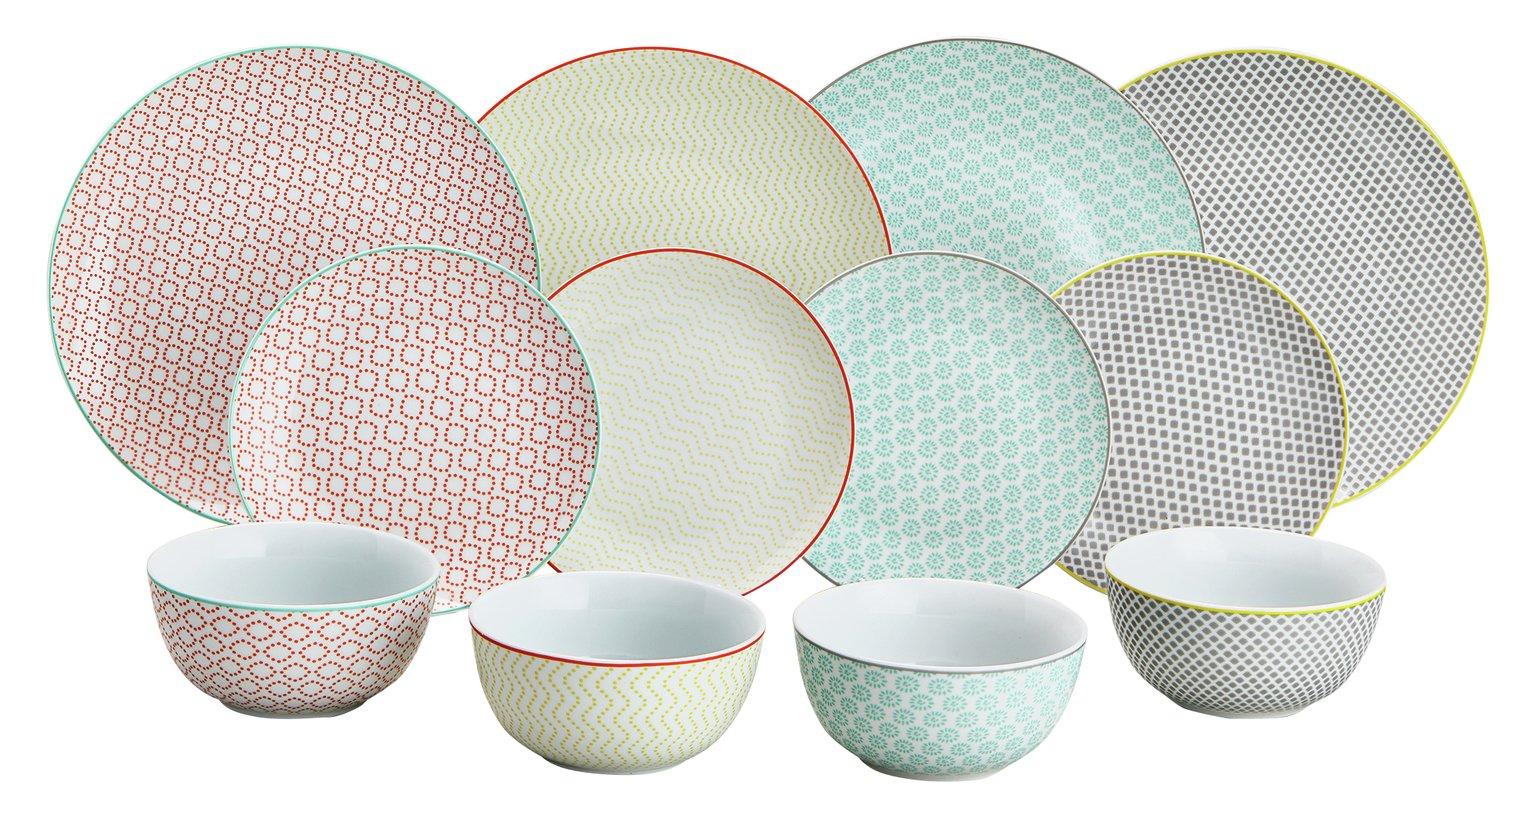 Argos Home Tilda 12 Piece Dinner Set - Multicoloured